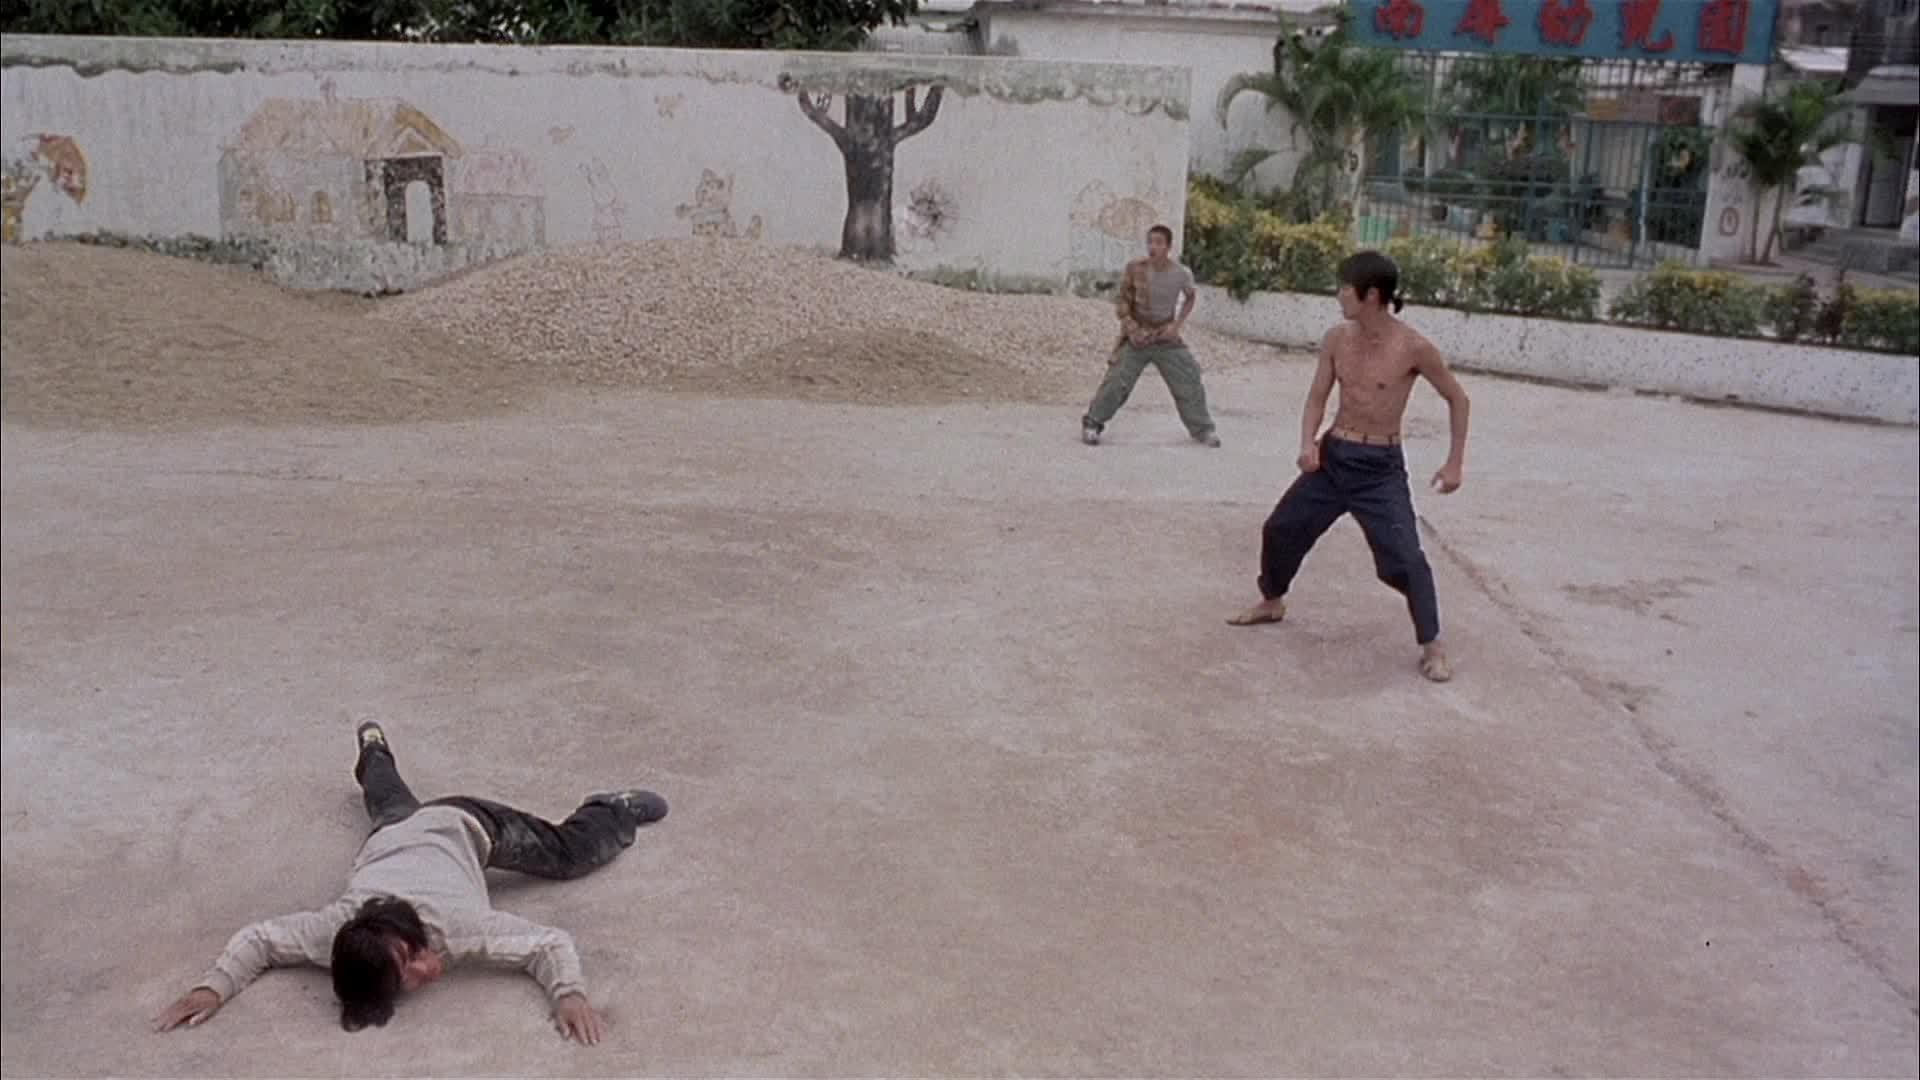 Shaolin Soccer - I'm Here to Play Soccer